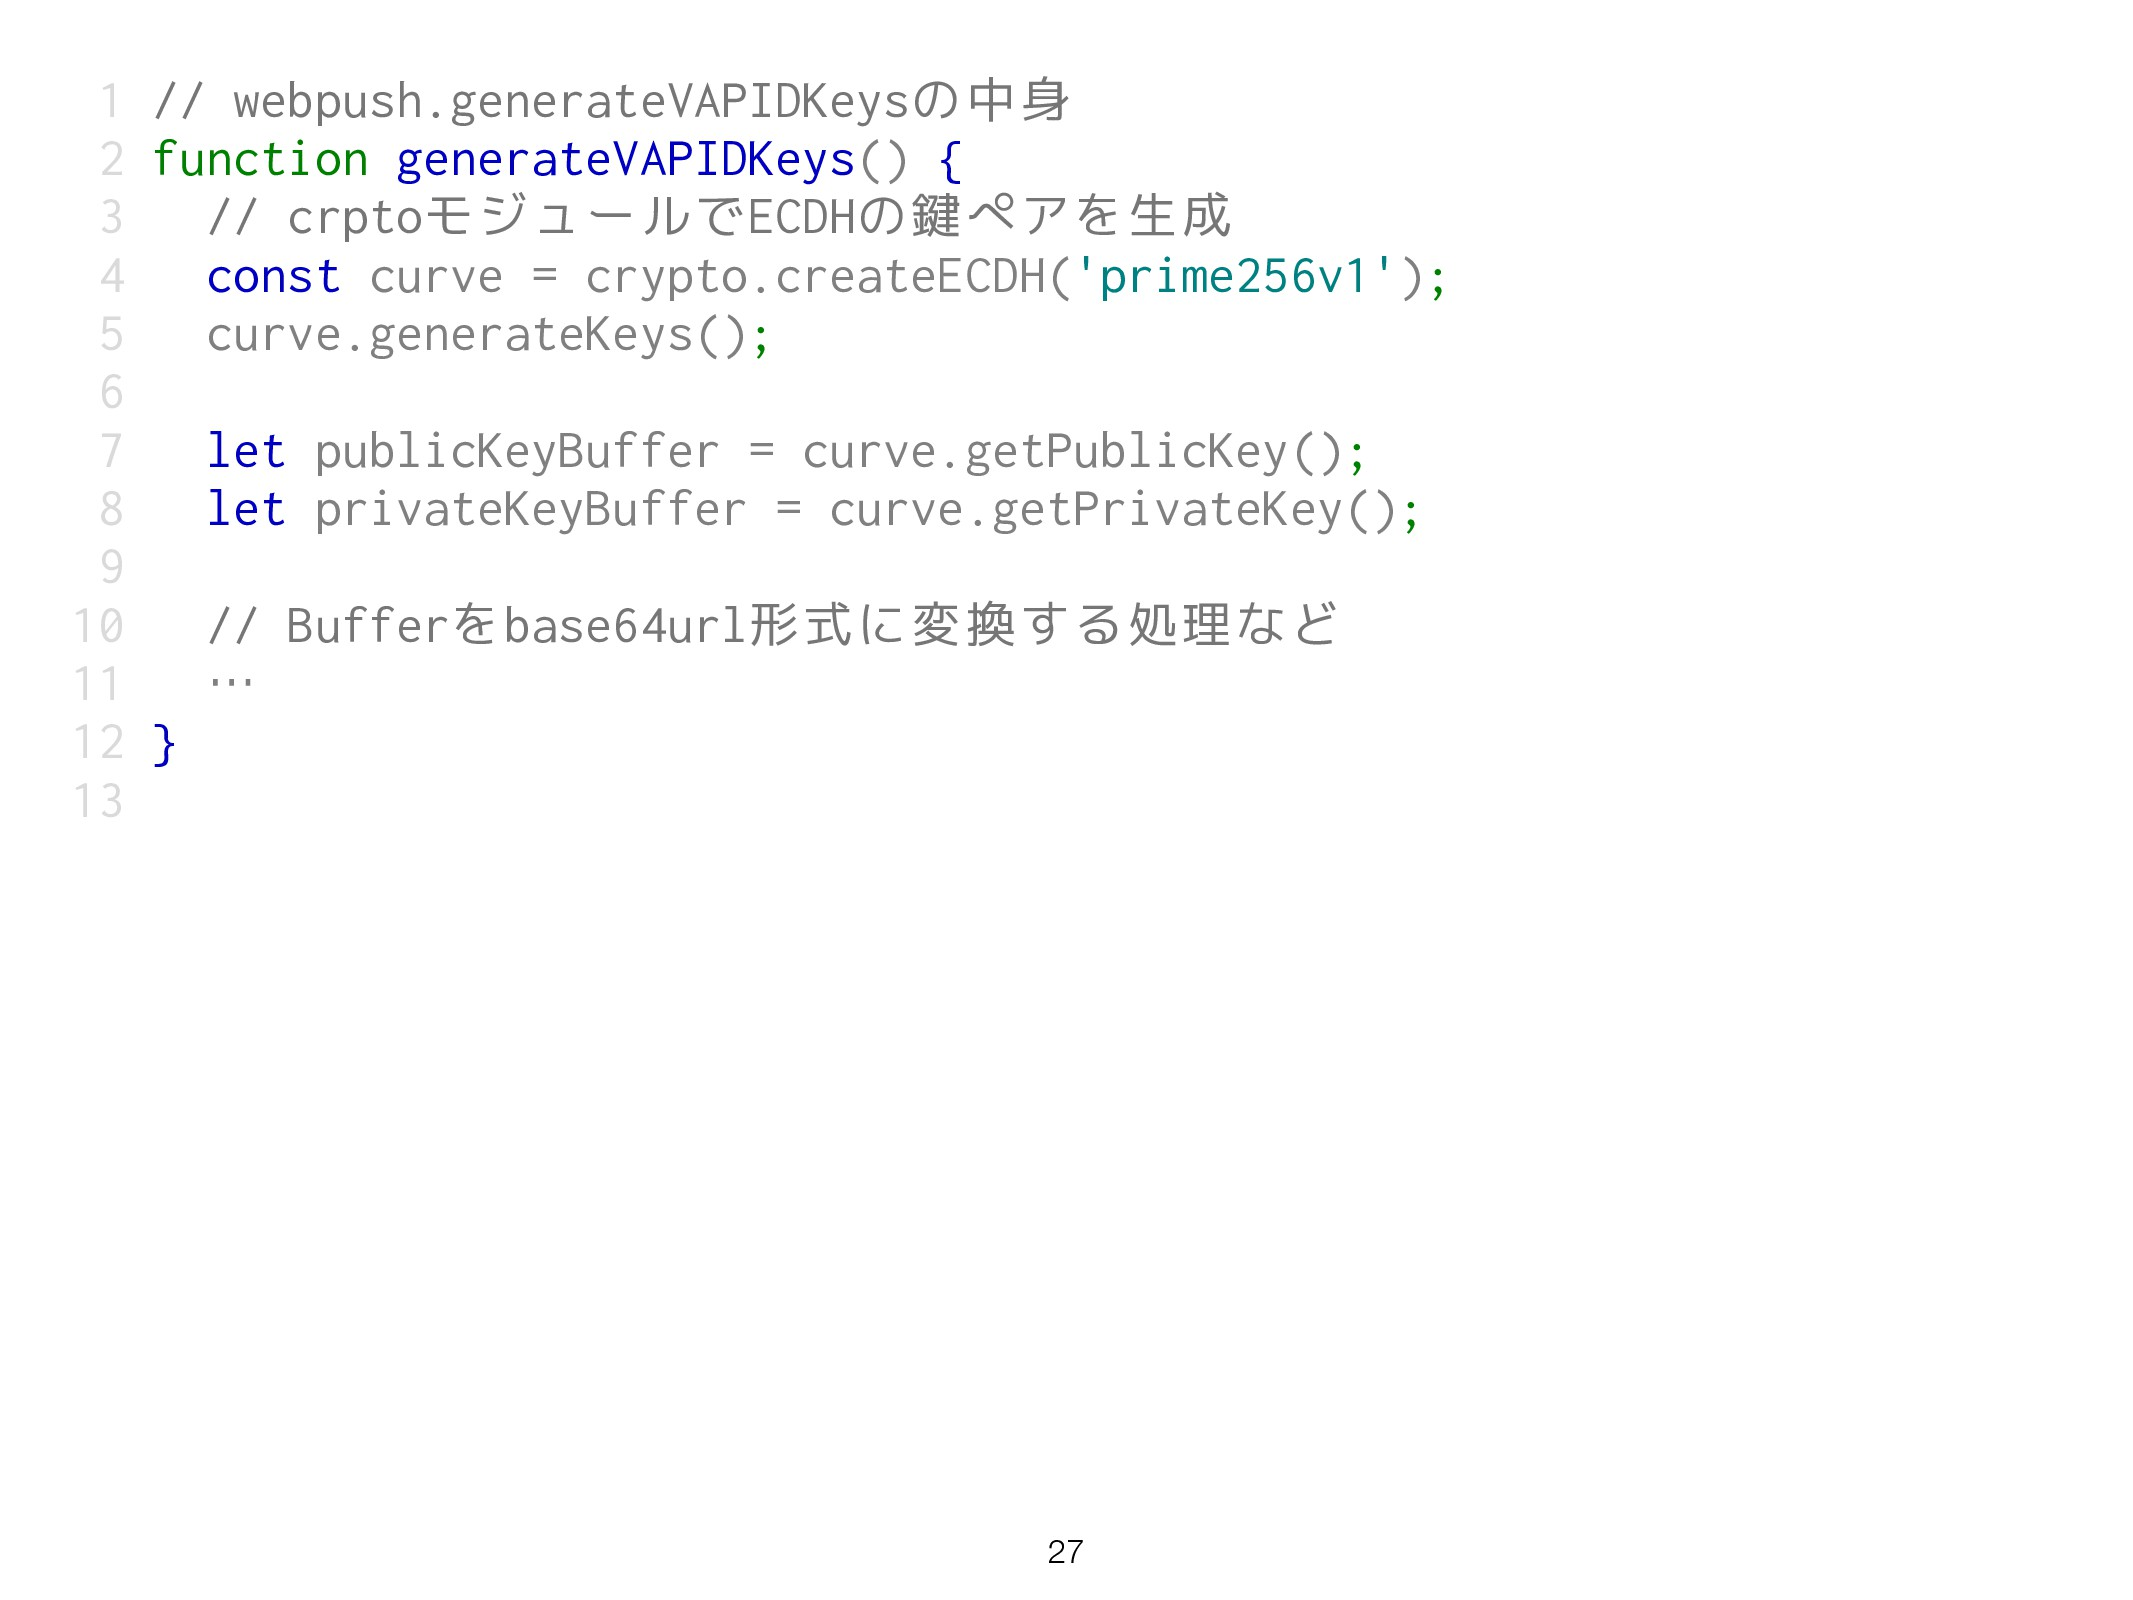 1 // webpush.generateVAPIDKeysの中身 2 function ge...